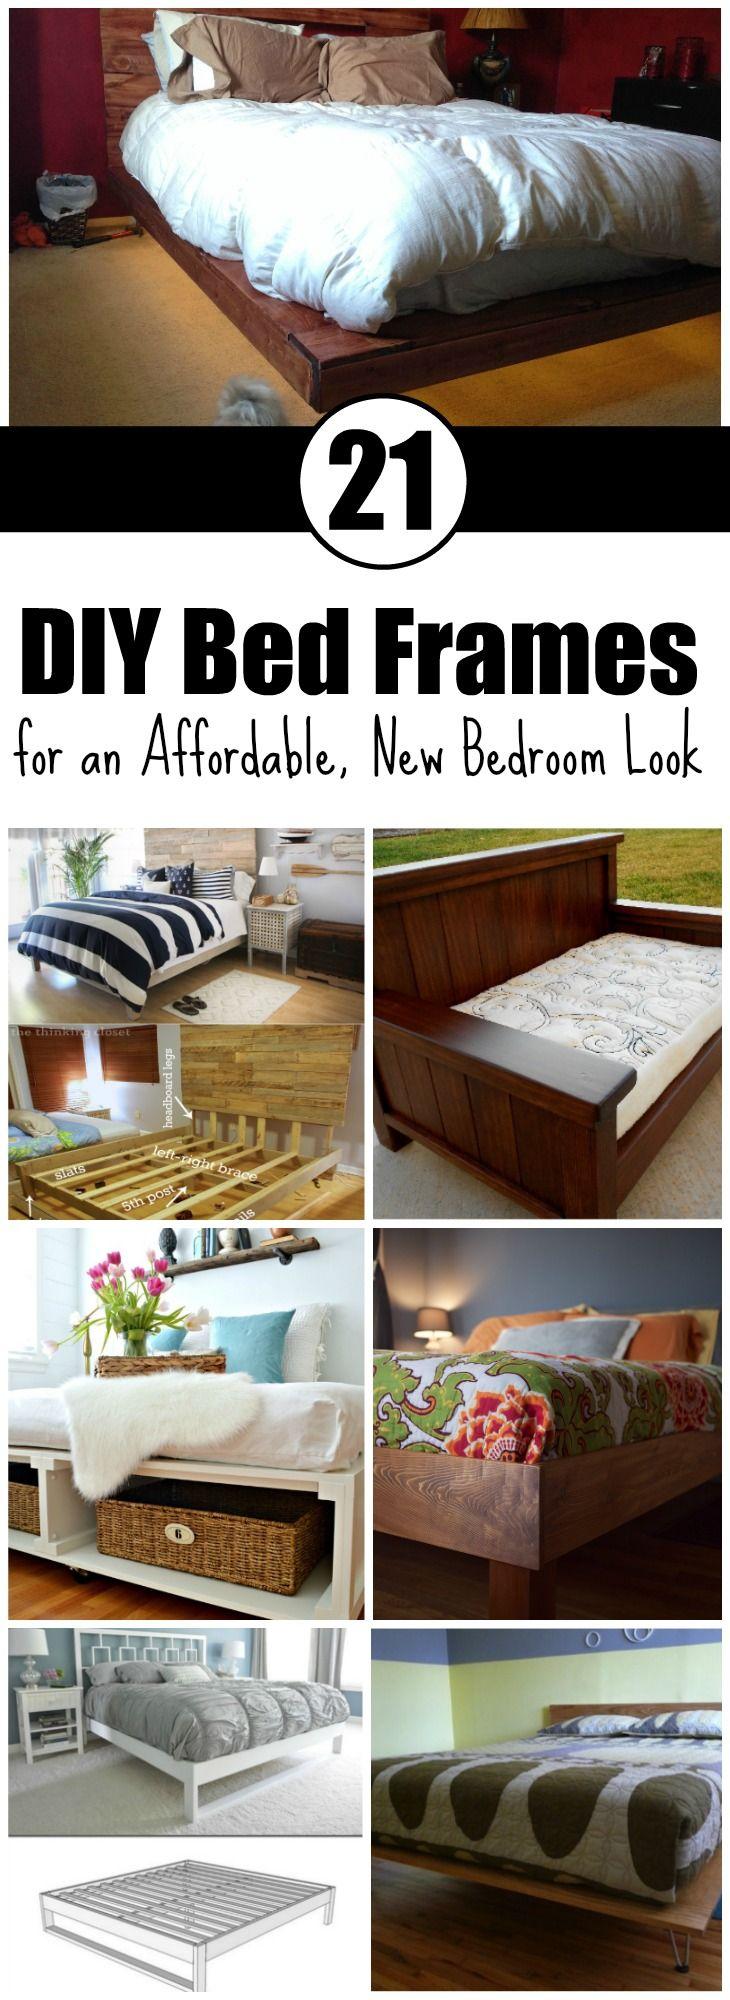 17 best ideas about bed frames on pinterest diy bed frame pallet platform bed and bed frame and mattress